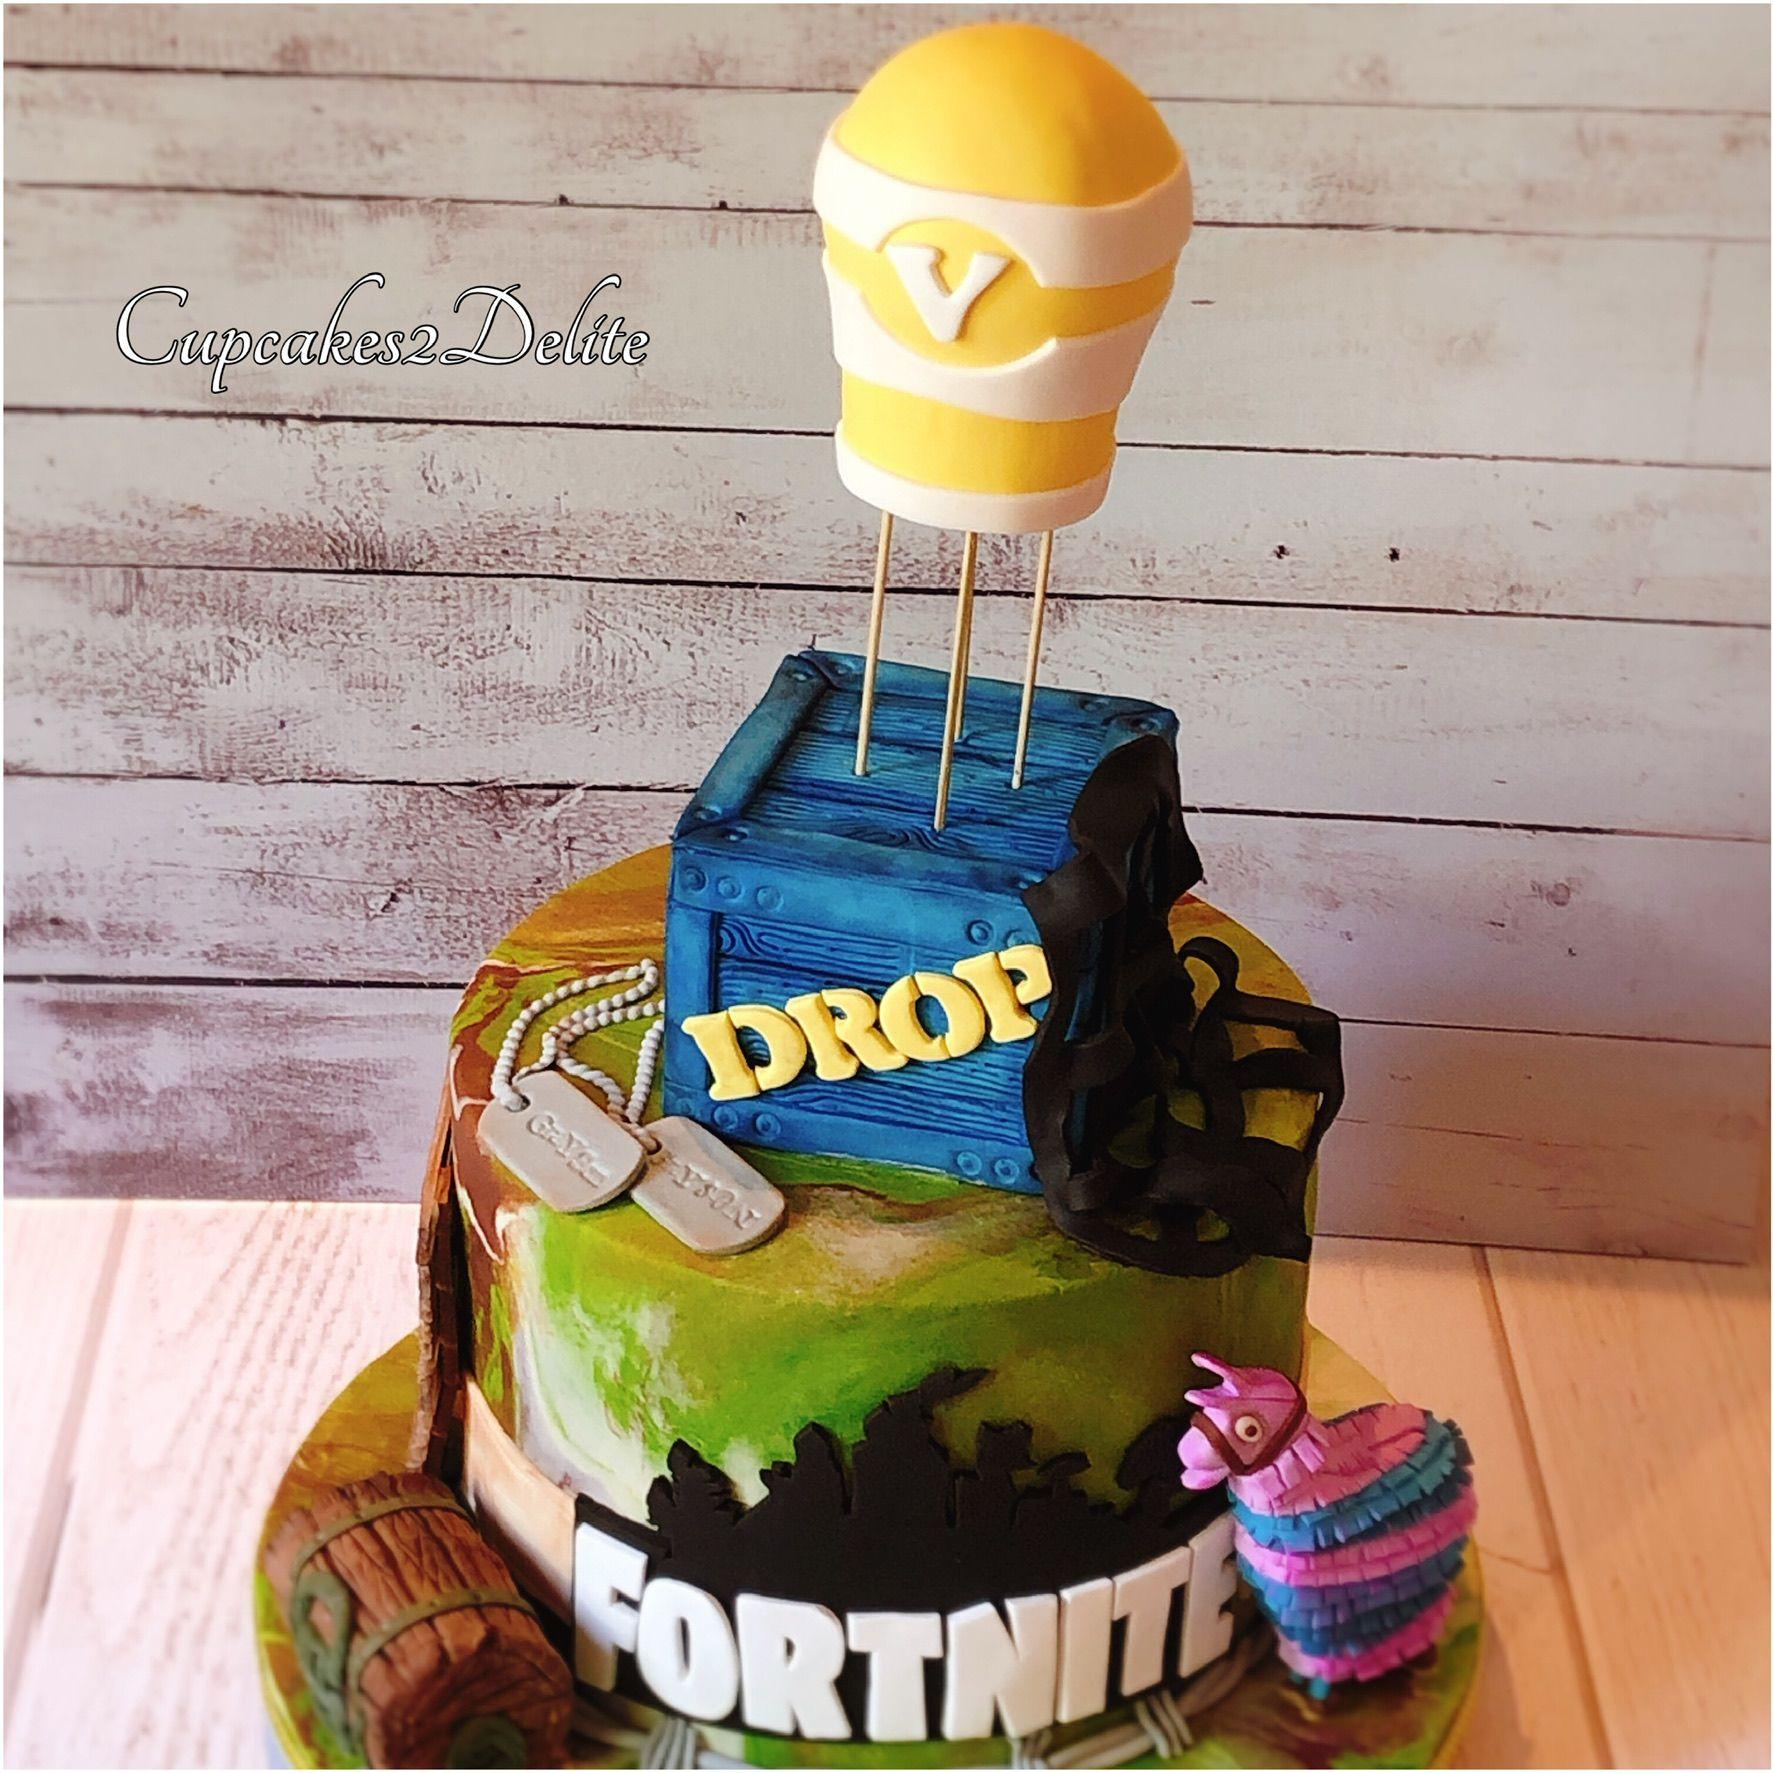 Fortnite cake cool cake designs birthday party cake 10